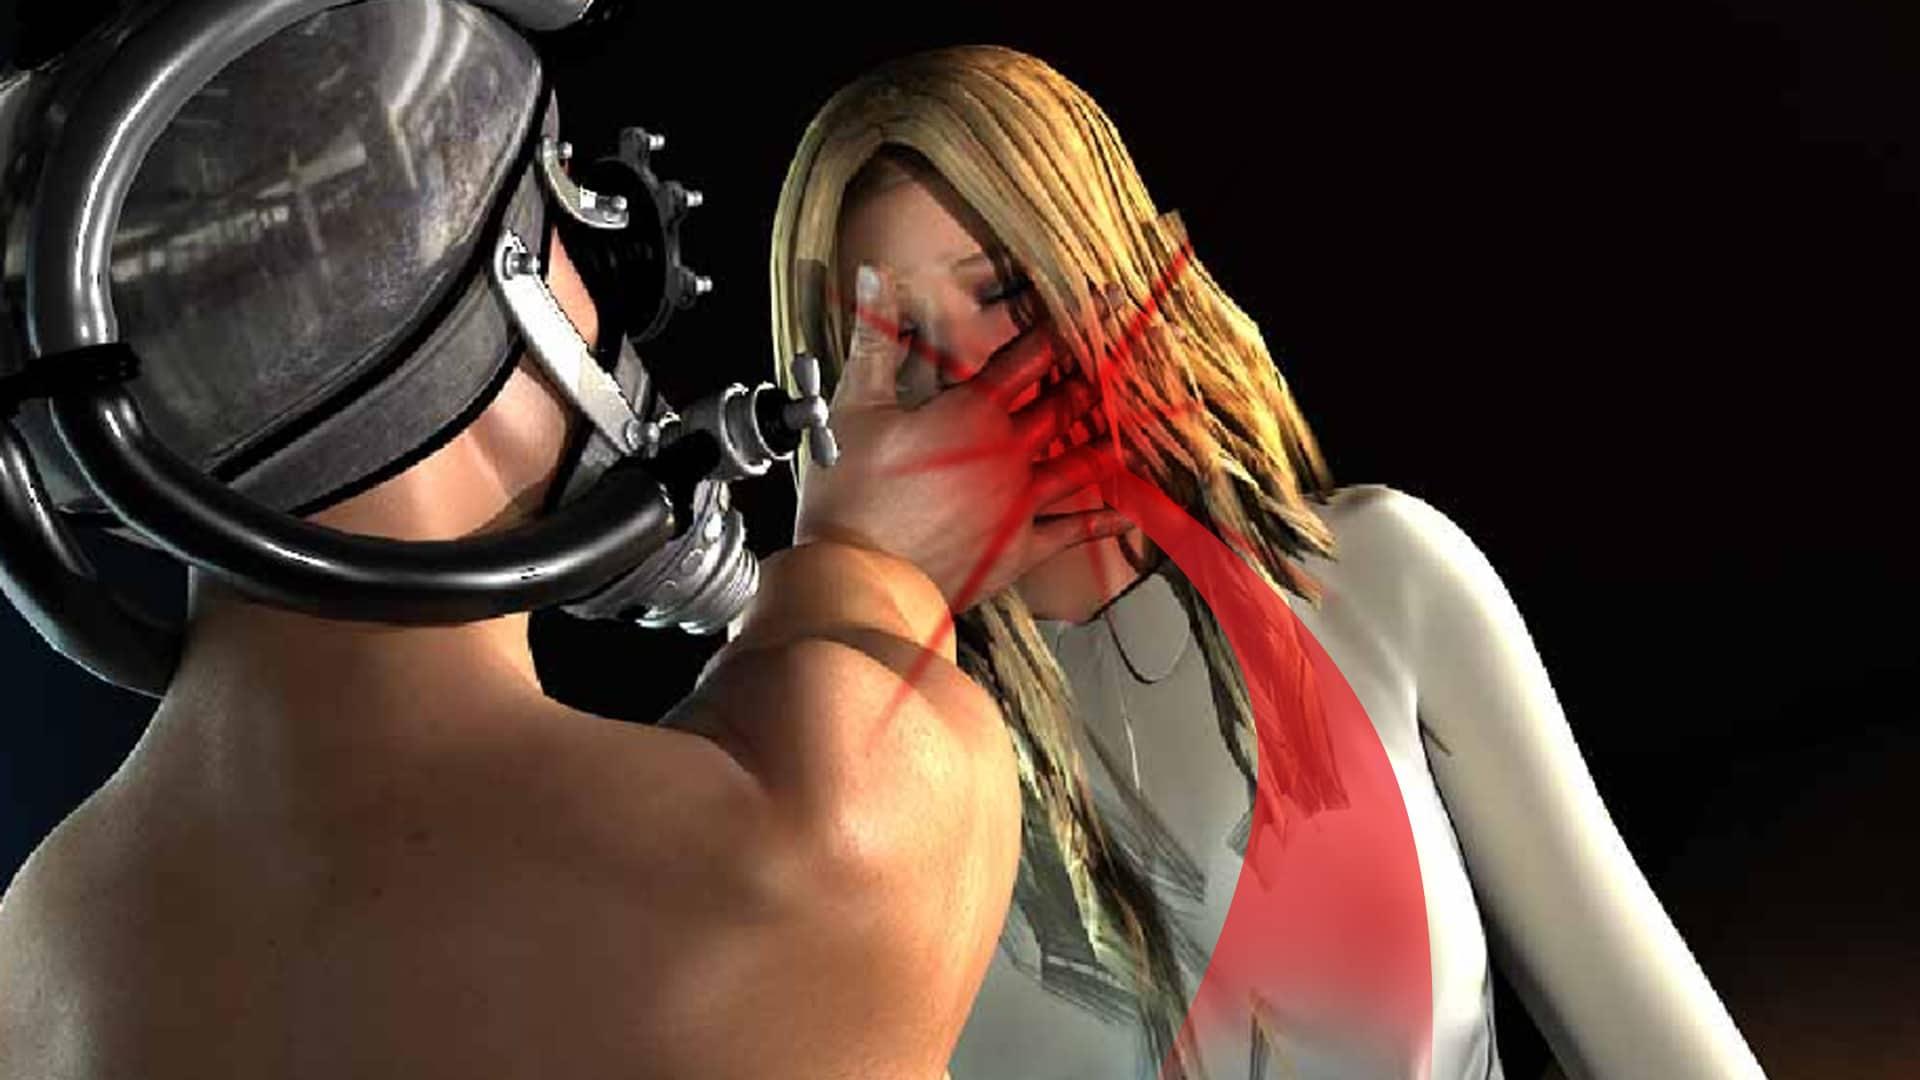 Violent XXX Sex Games